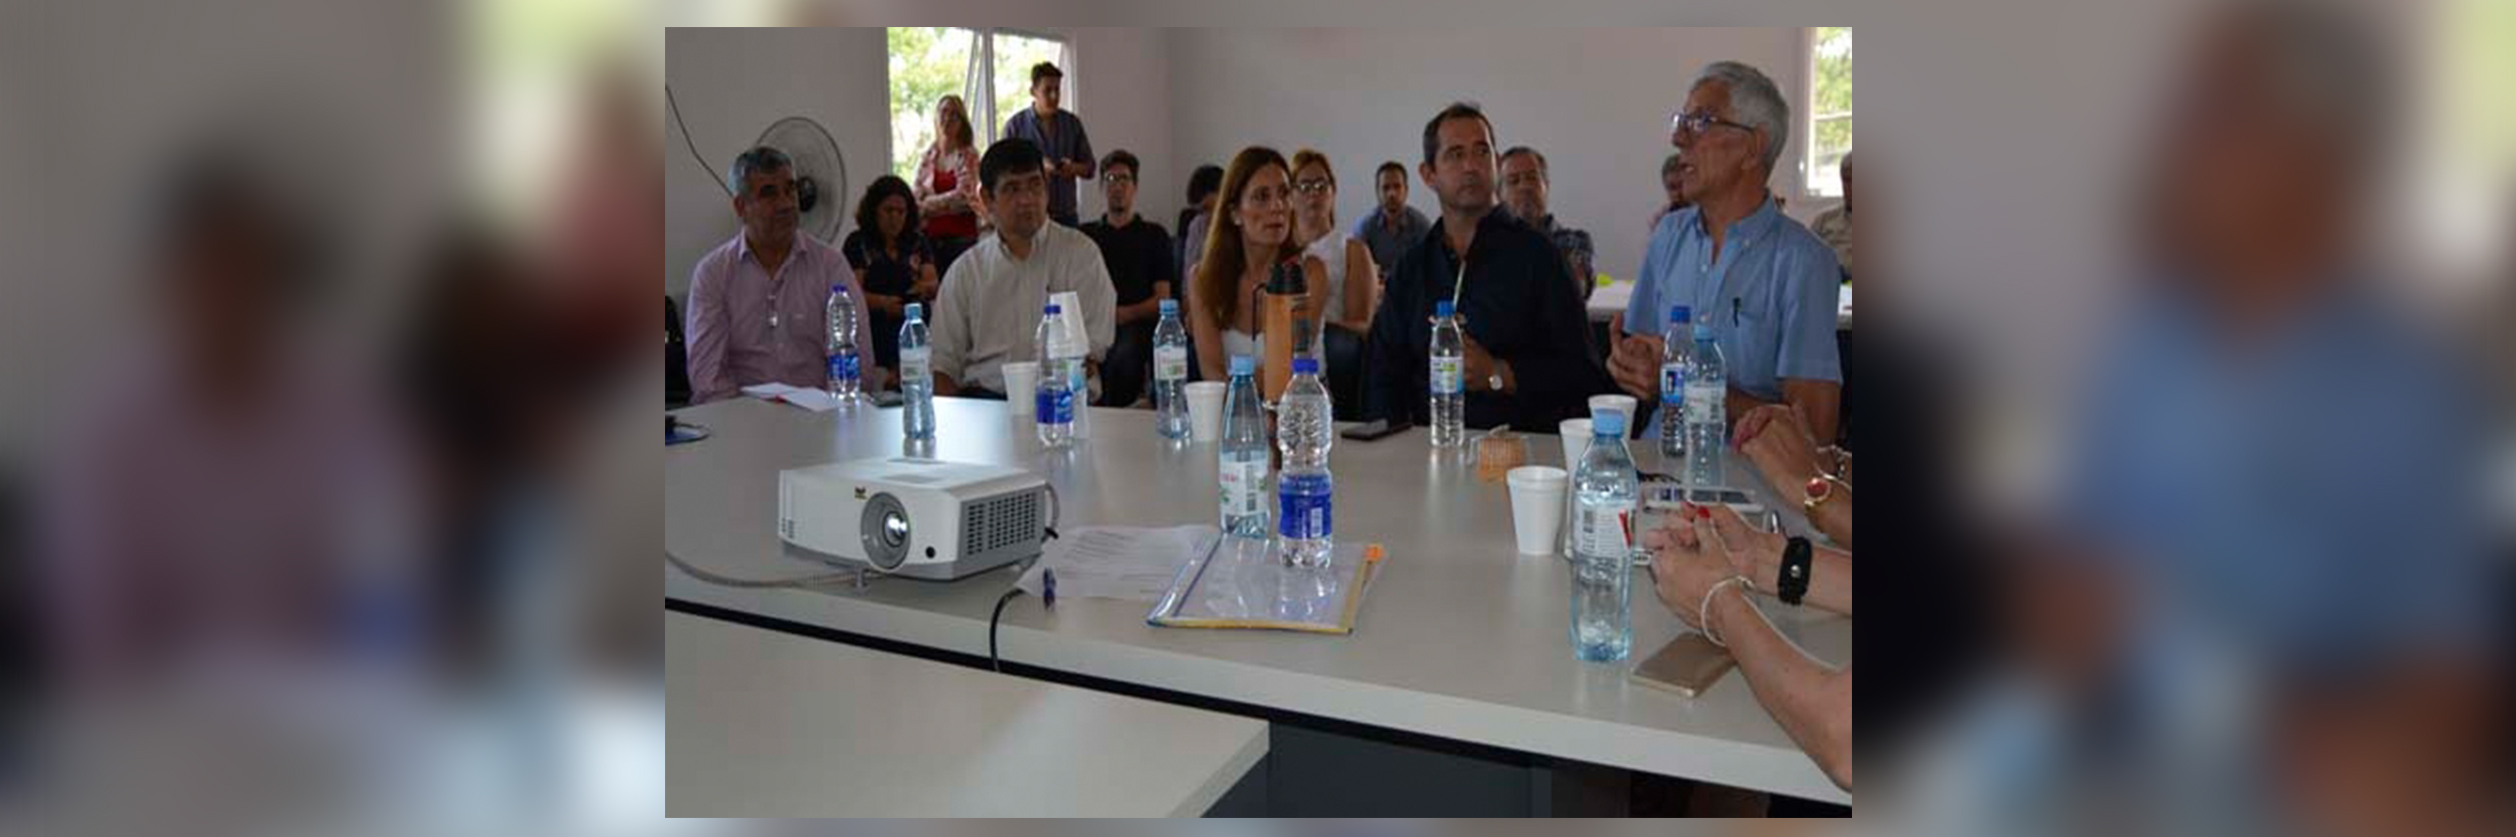 Intendentes del área metropolitana se reunieron en Candelaria para avanzar en proyectos en común